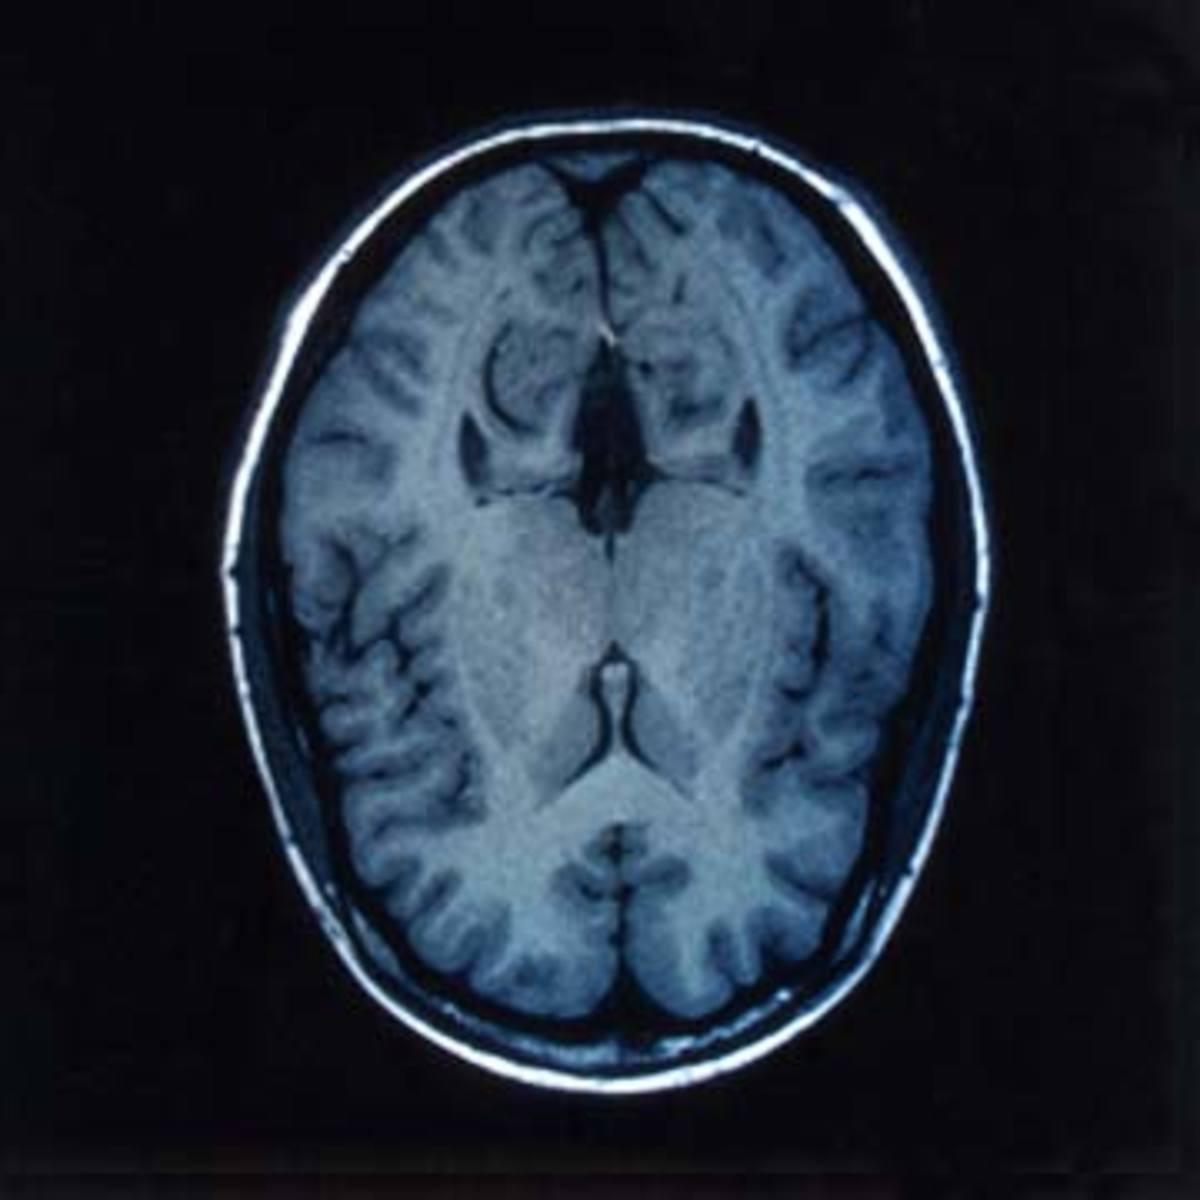 An MRI brain scan image